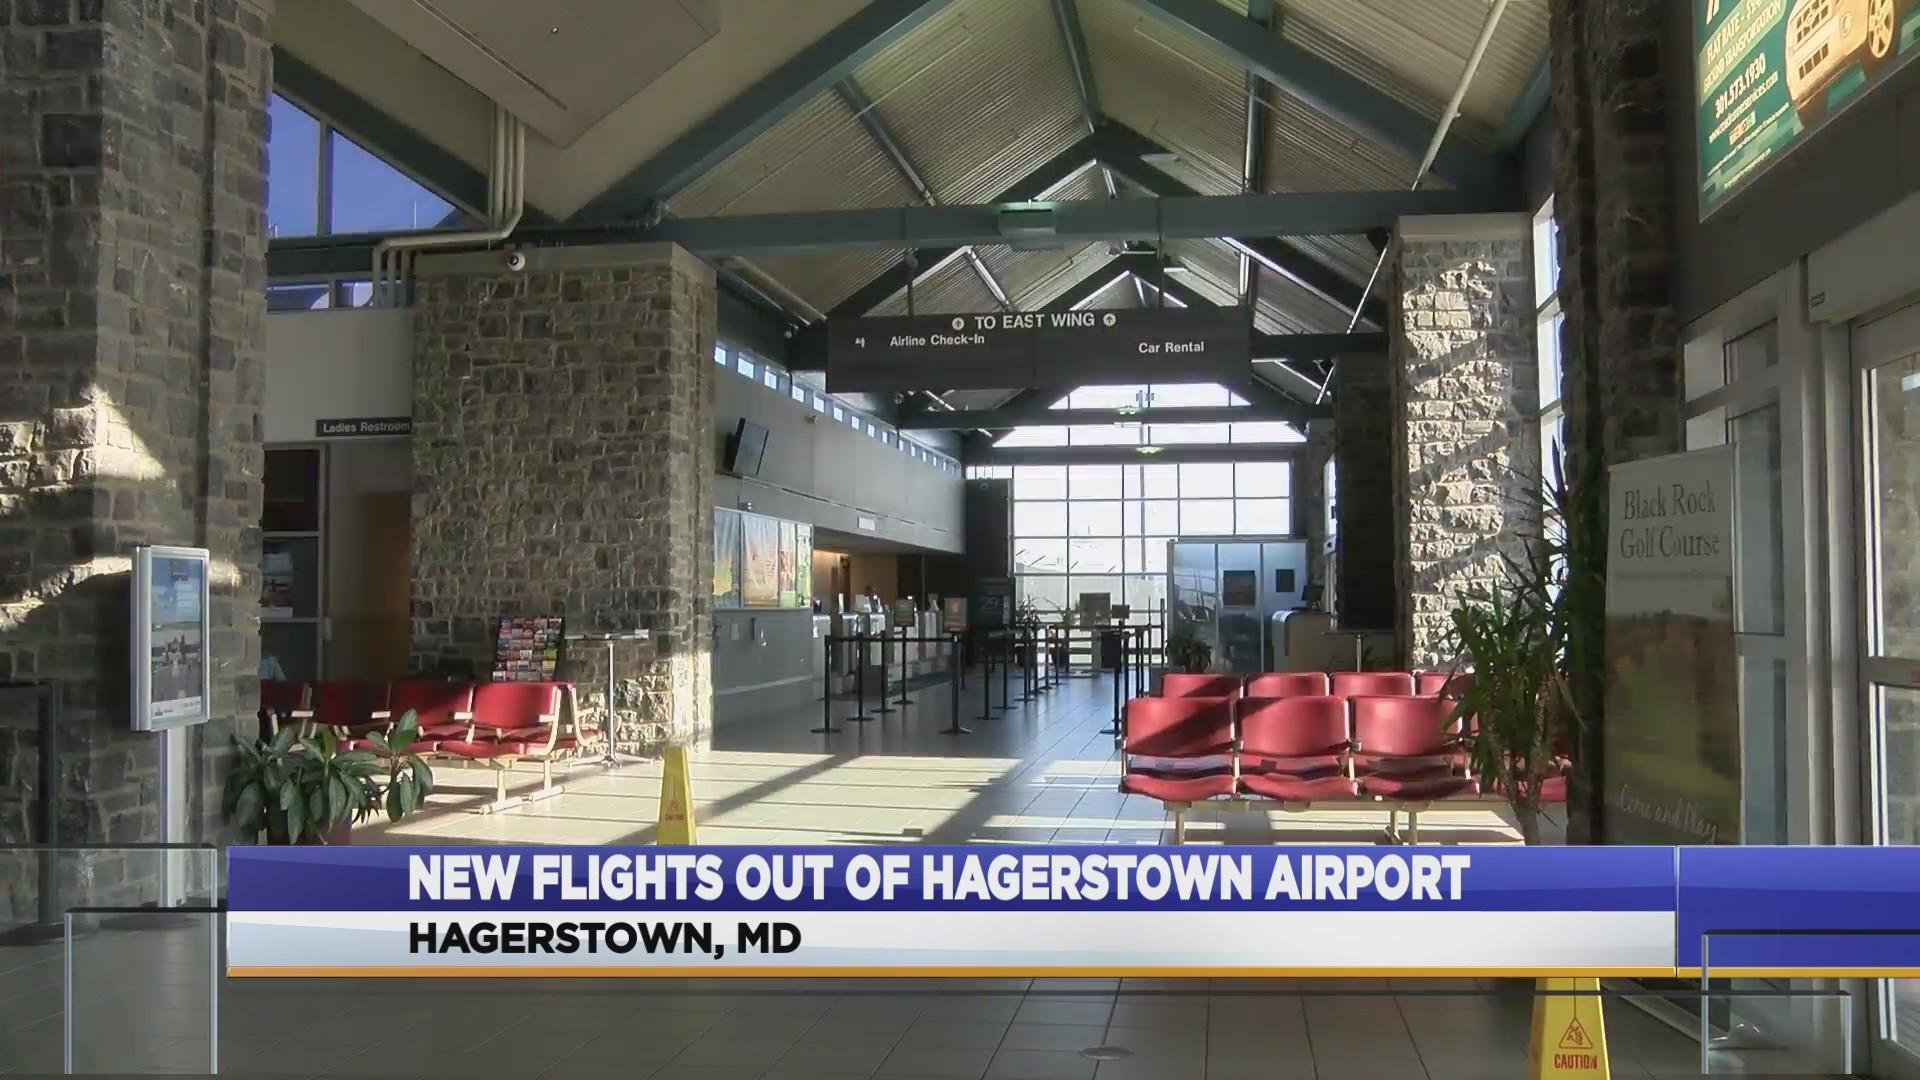 Hagerstown_airport_0_20190116000905